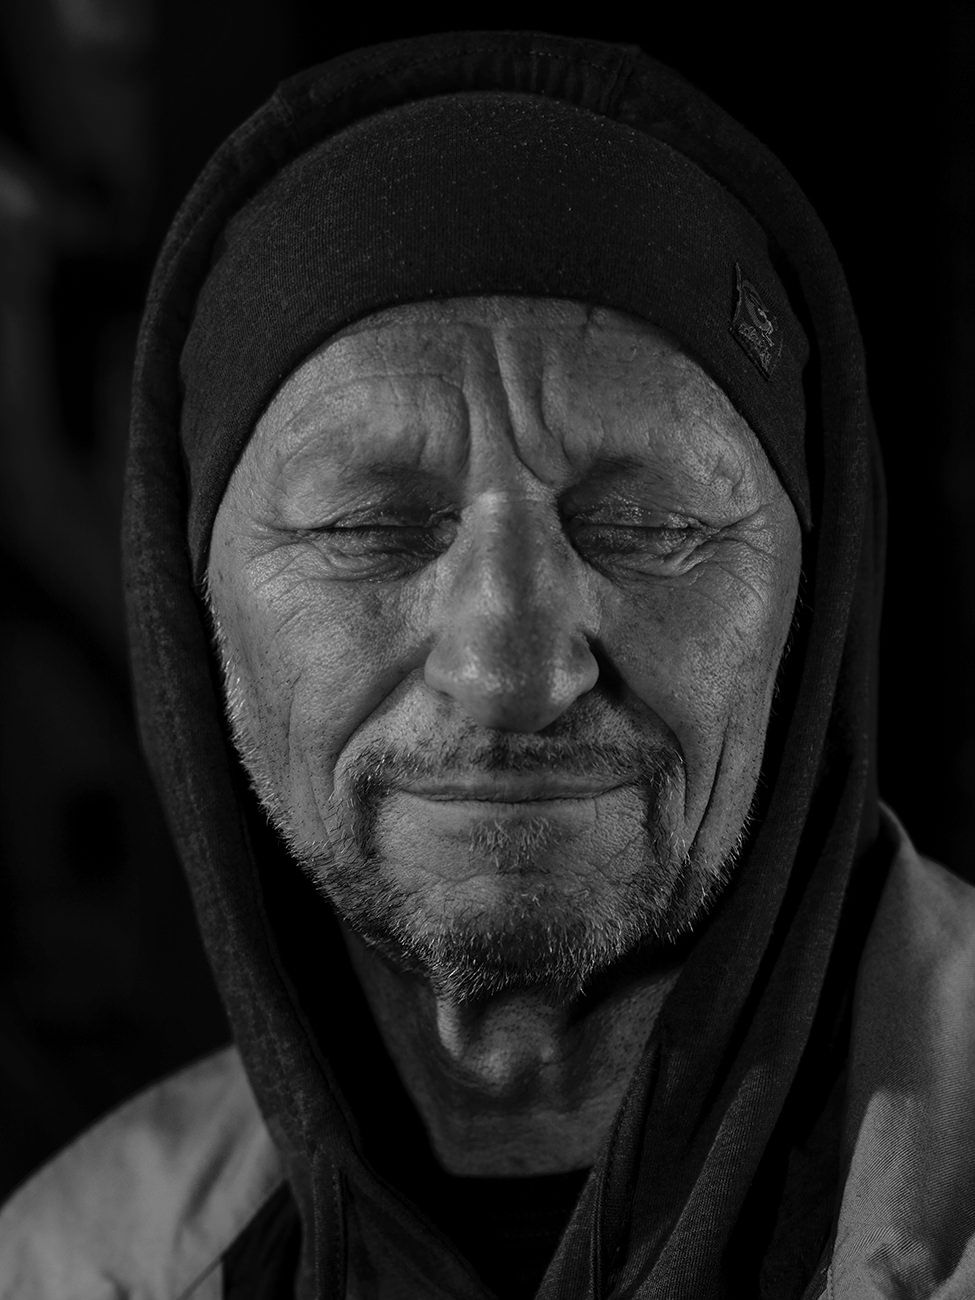 Titus Dittmann for Focus, 2015, portrait, Titus, Titus Dittmann, Skate, Muenster, Germany, Focus, Anke Luckmann, www.ankeluckmann.com, trey